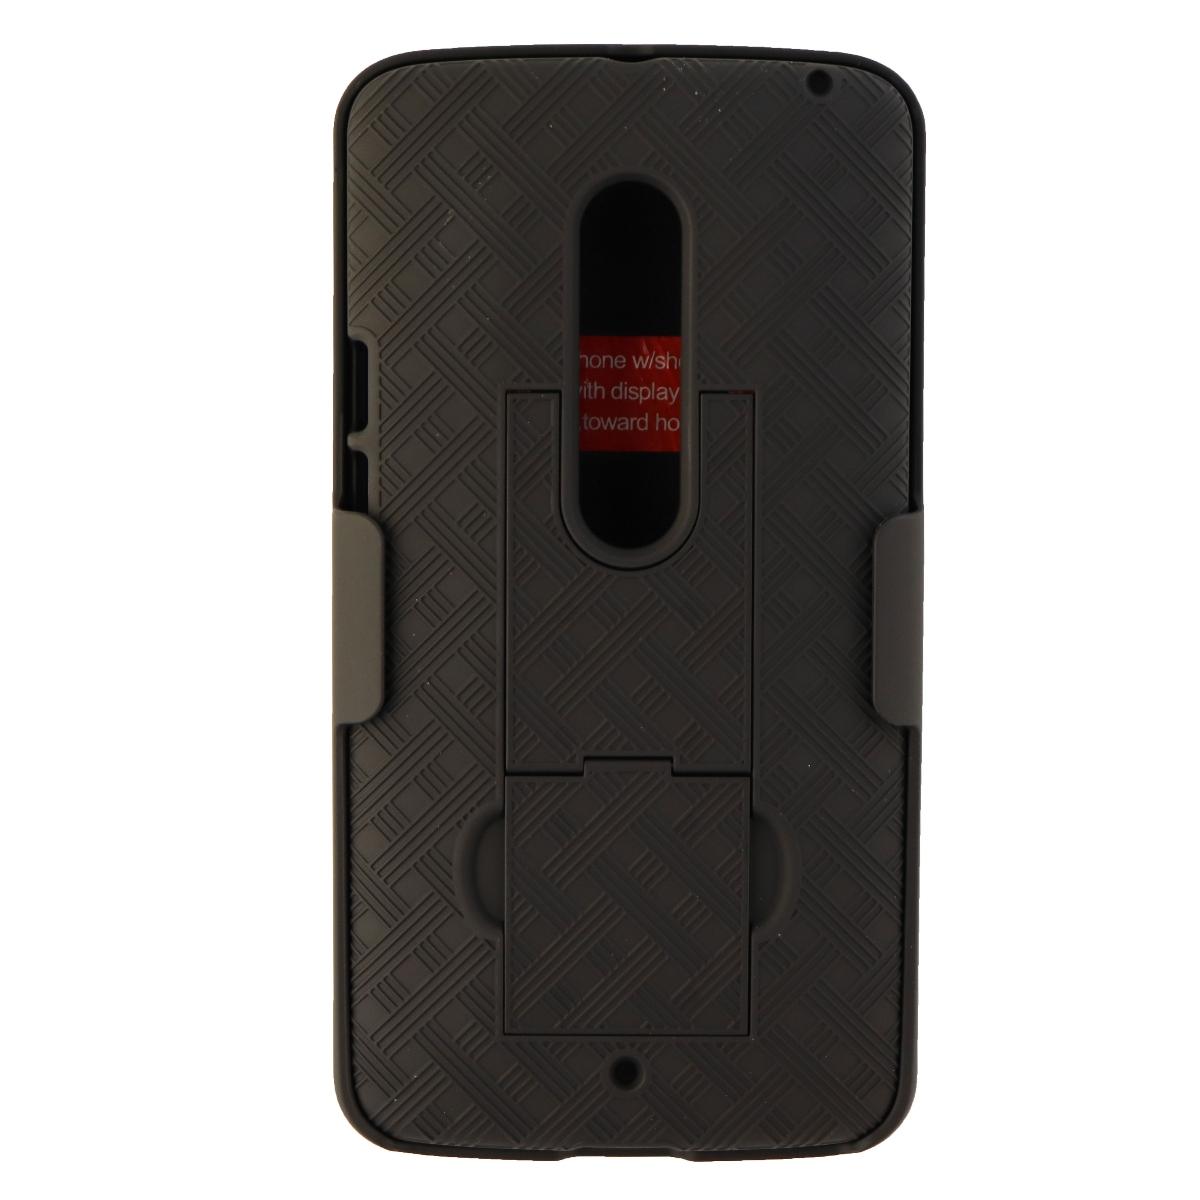 Verizon Hardshell Case and Belt Holster Combo for Motorola Droid Maxx 2 - Black